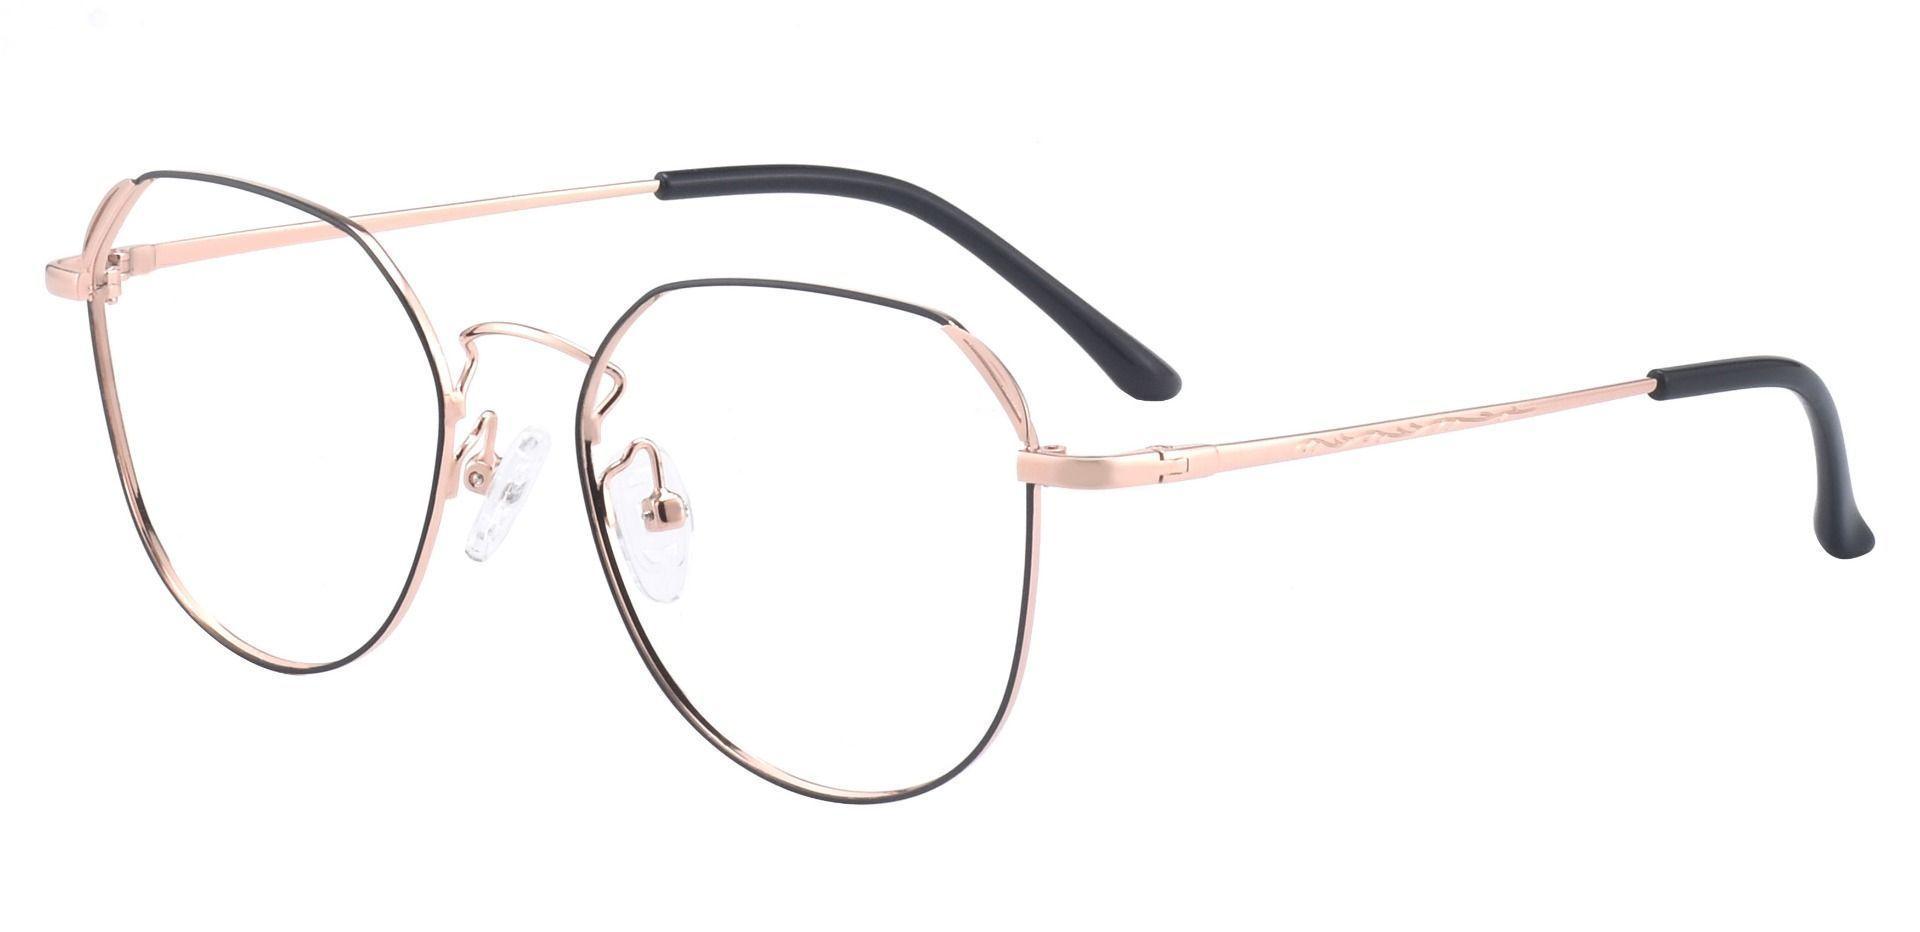 Figaro Geometric Prescription Glasses - Pink